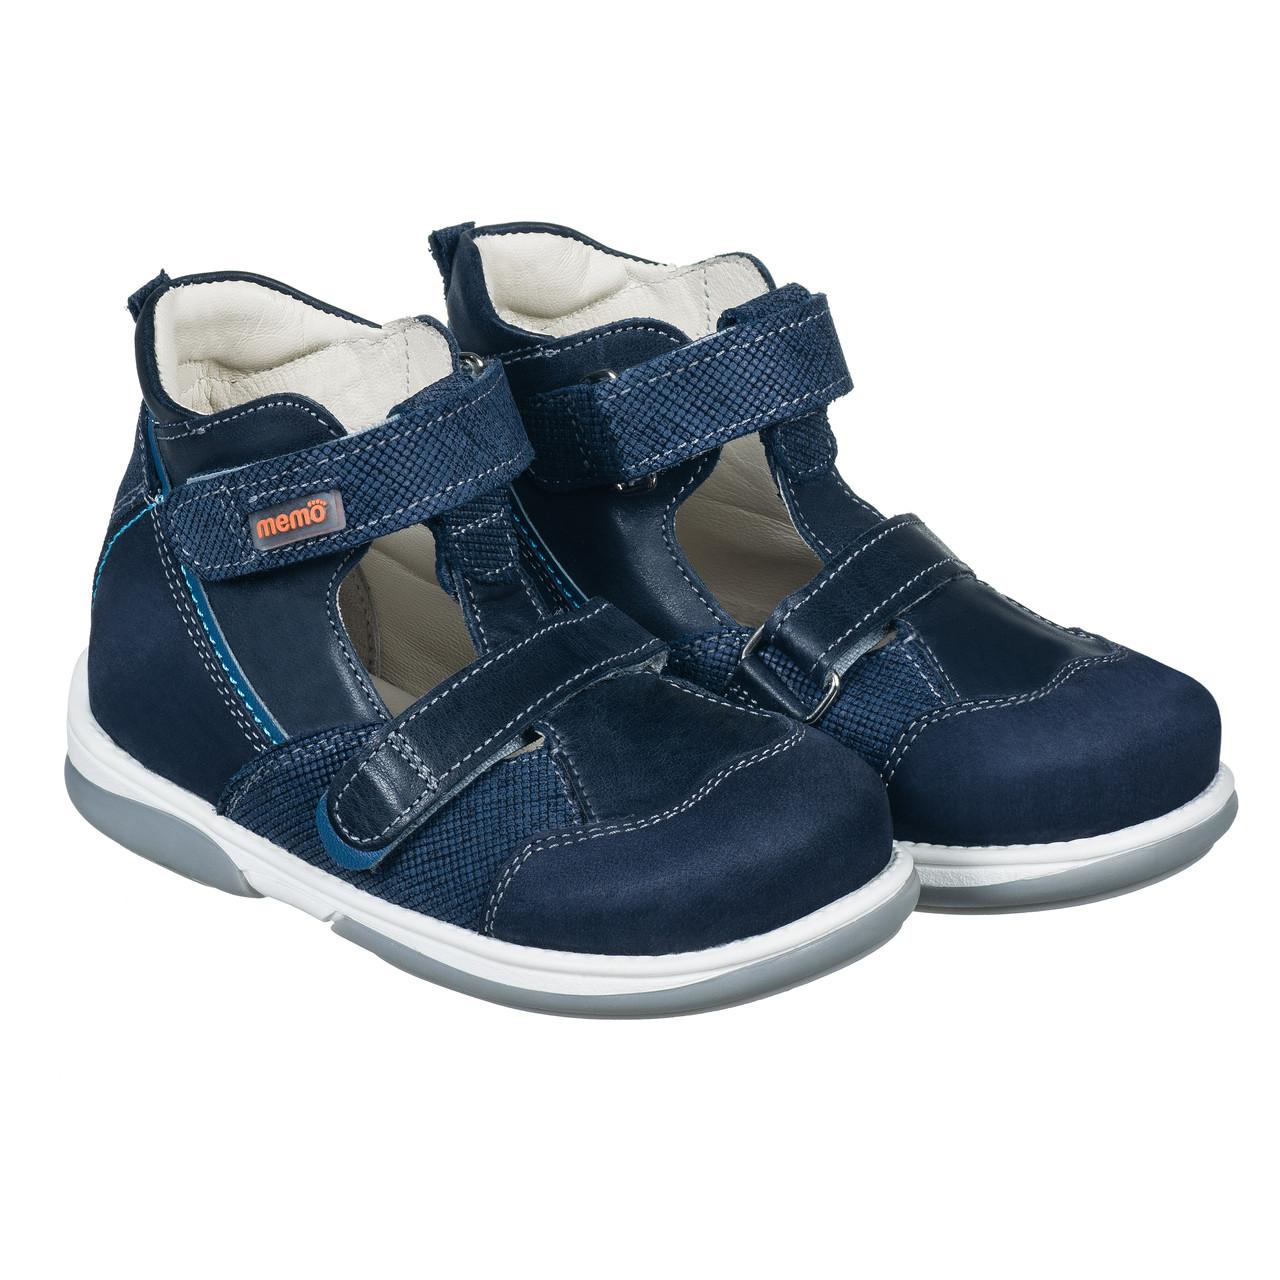 9974030ebecb24 Memo Torino 3DA Синие - Ортопедические туфли для детей (р.22-29 ...